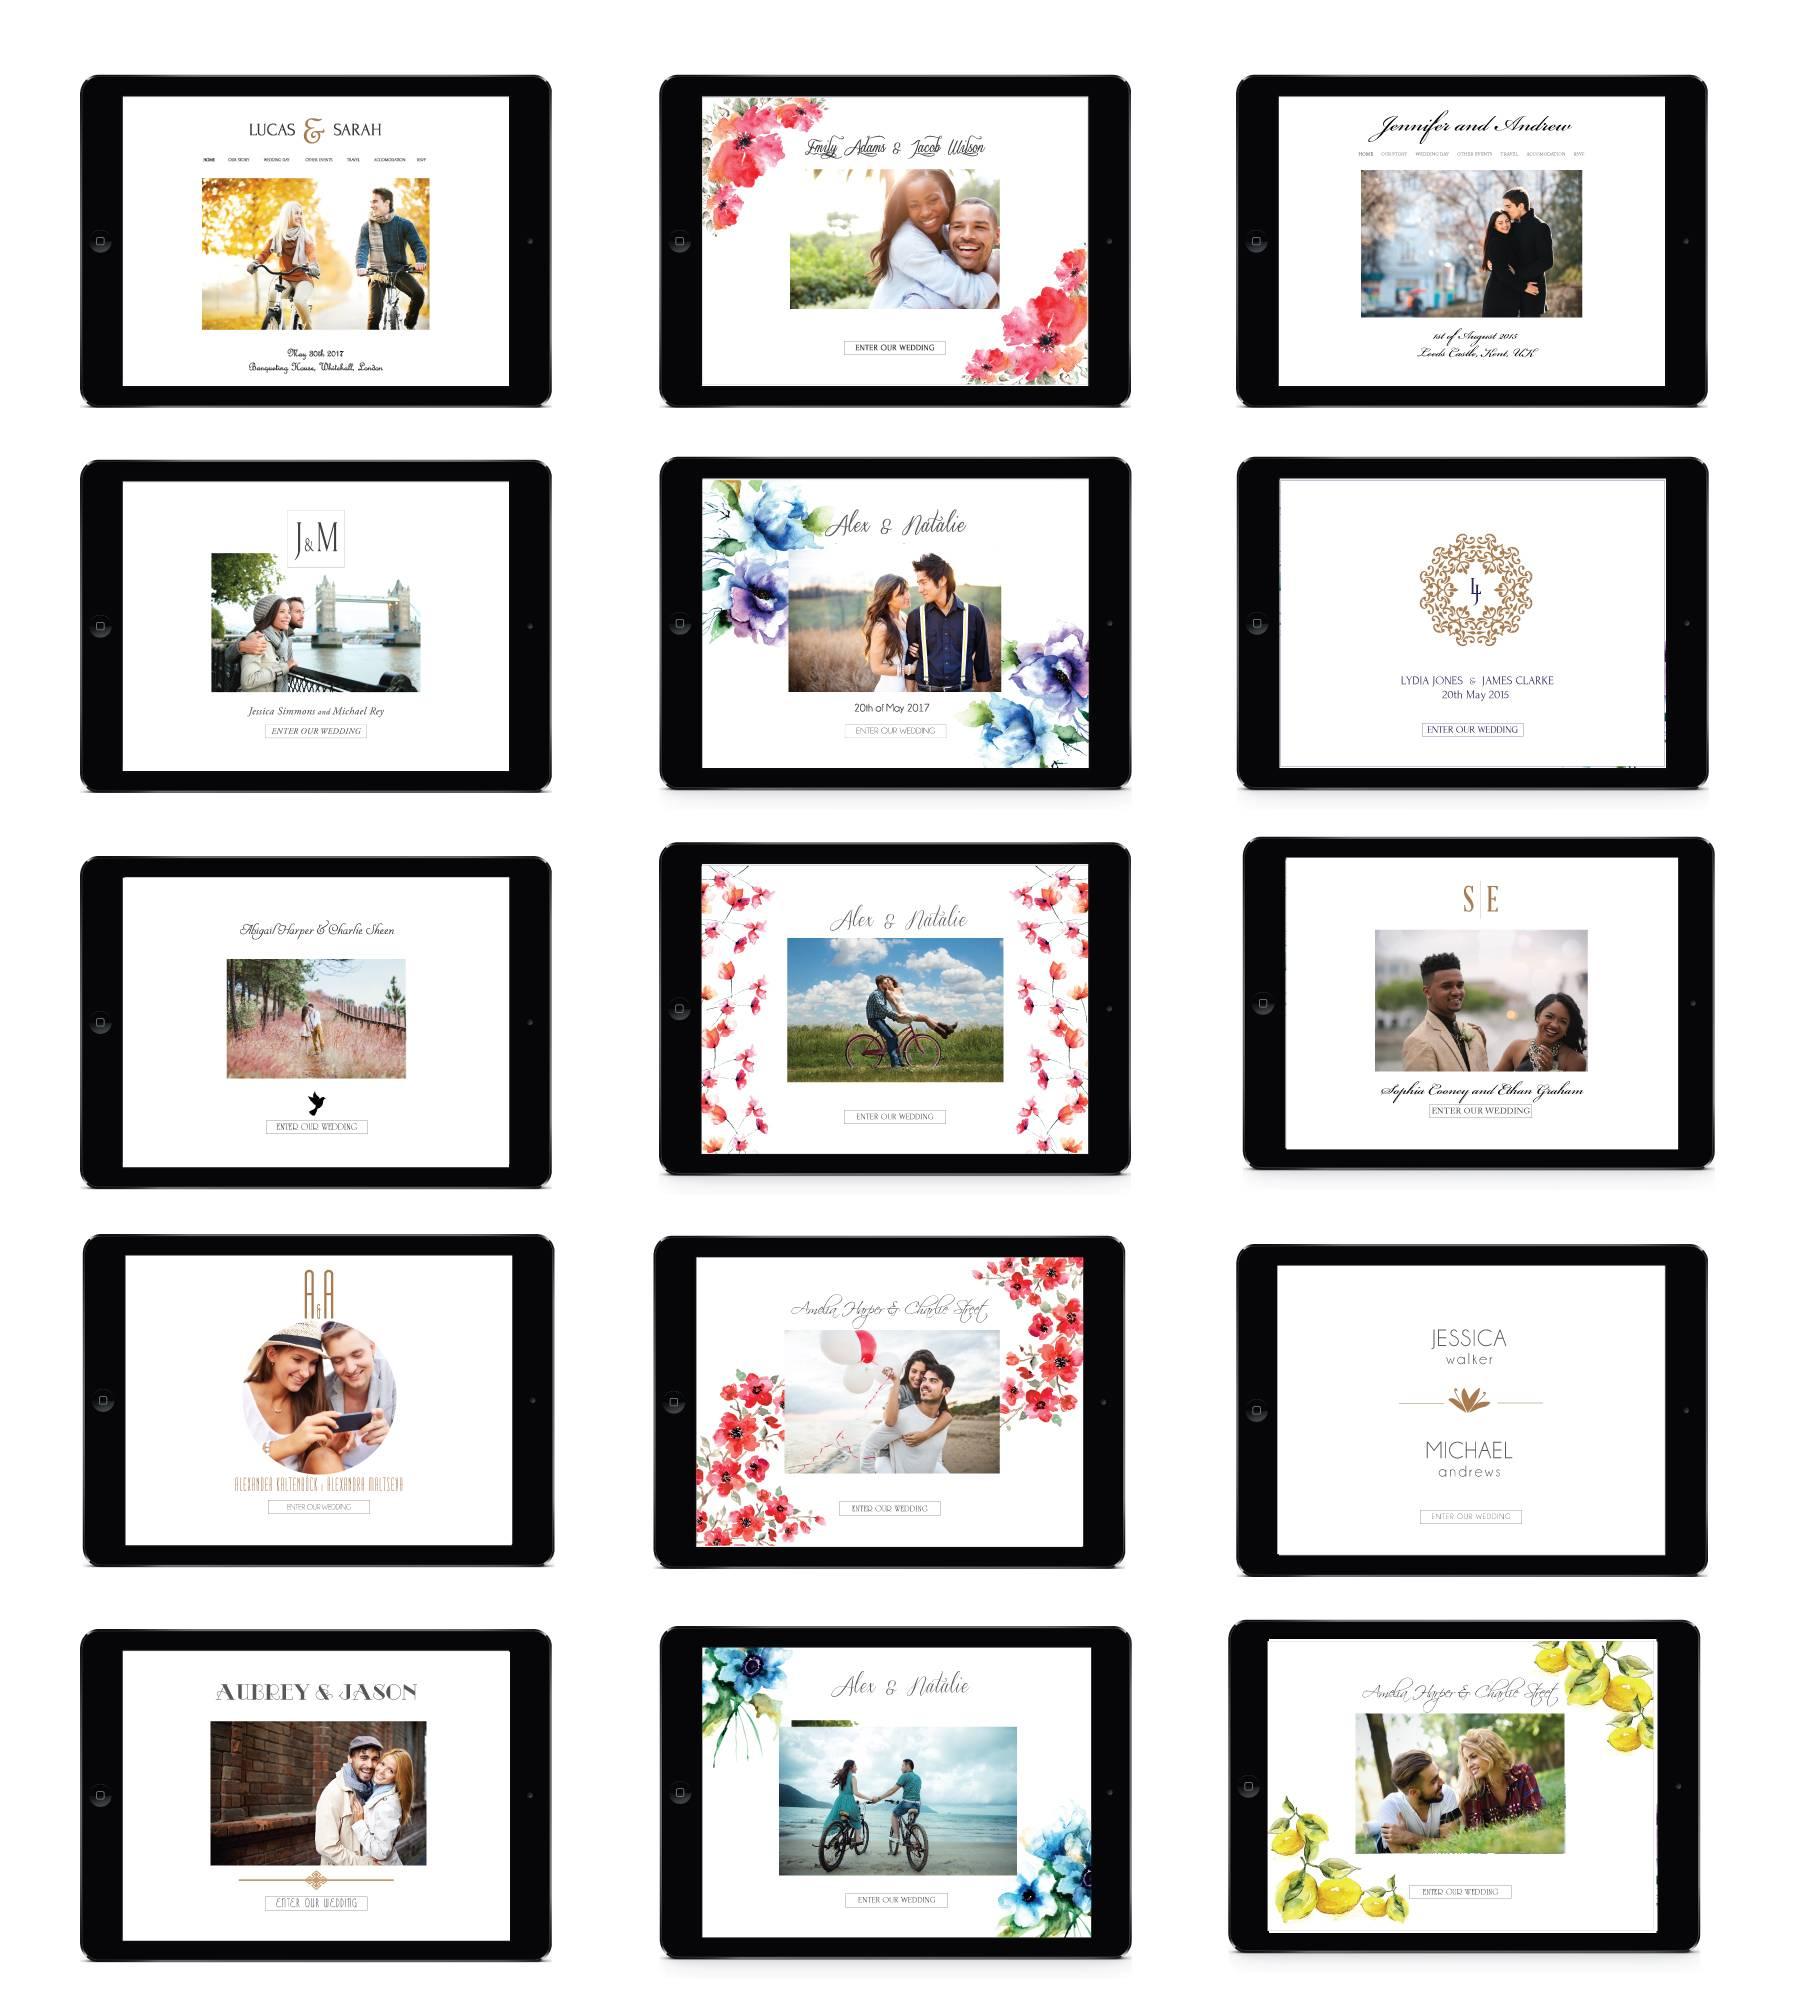 Website-design-examples-for-website